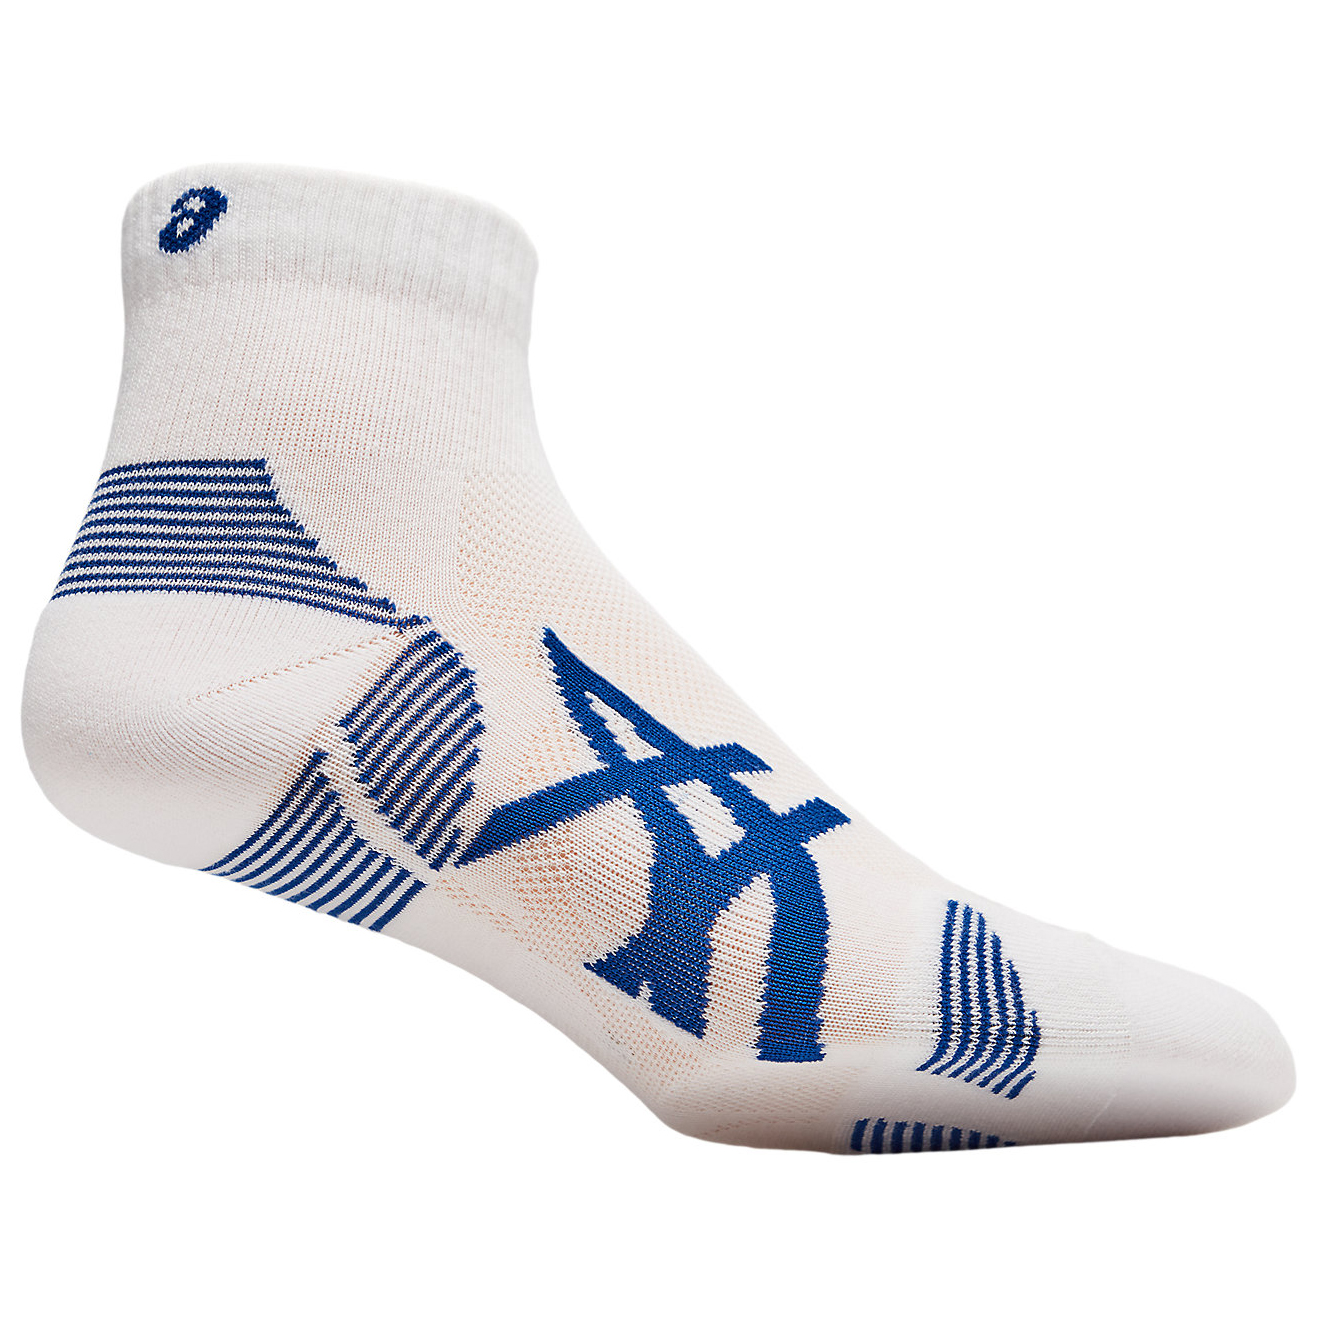 Asics - 2PPK Cushioning Sock - Running socks - Performance Black / Brilliant White | I (US)